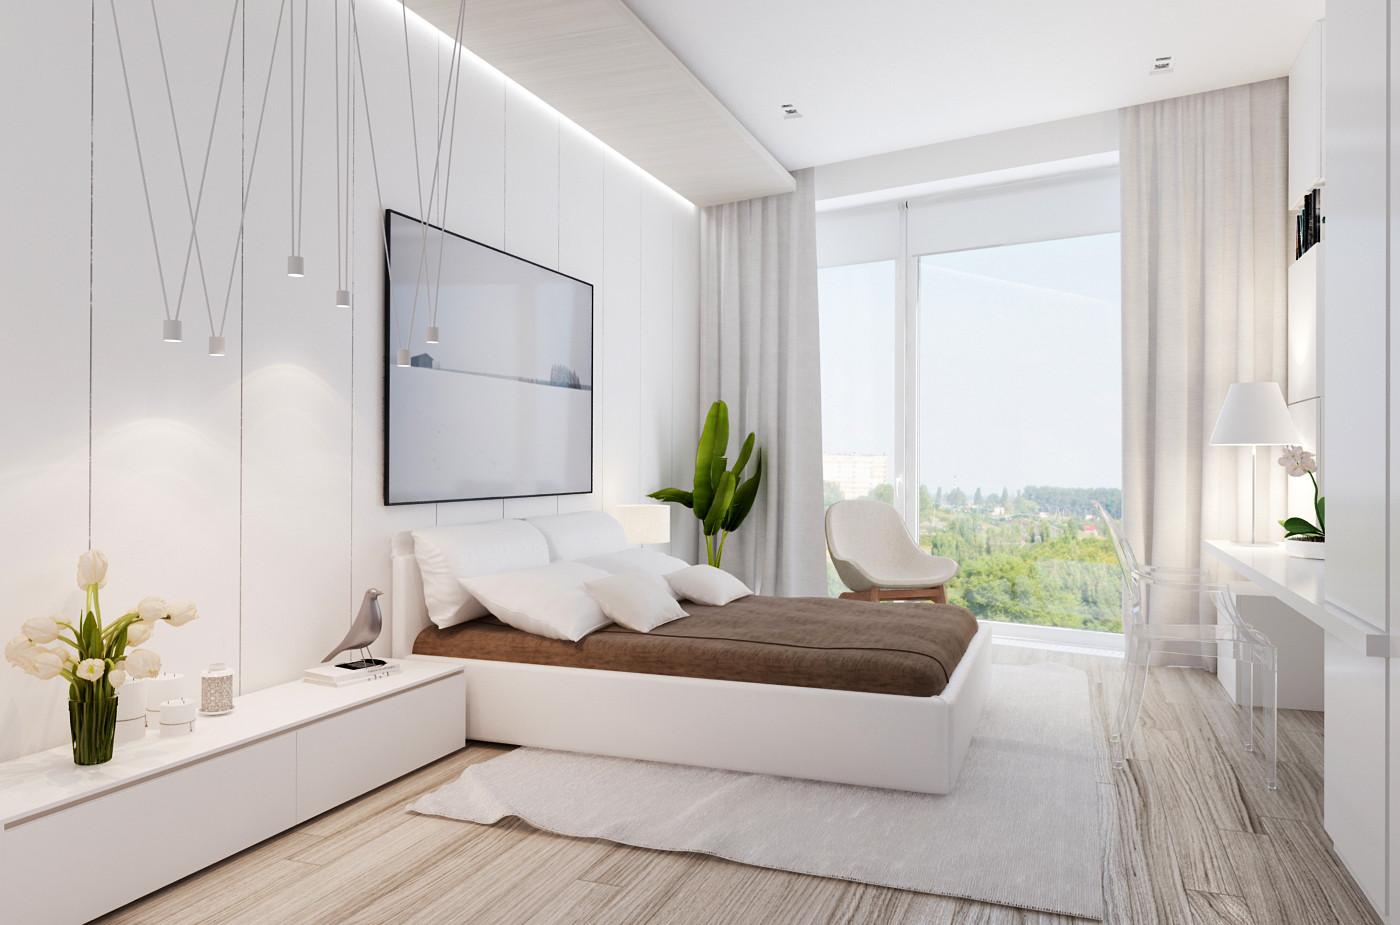 Un apartament cu 3 camere de vis testat n rom nia for Ideas para dormitorios de matrimonio